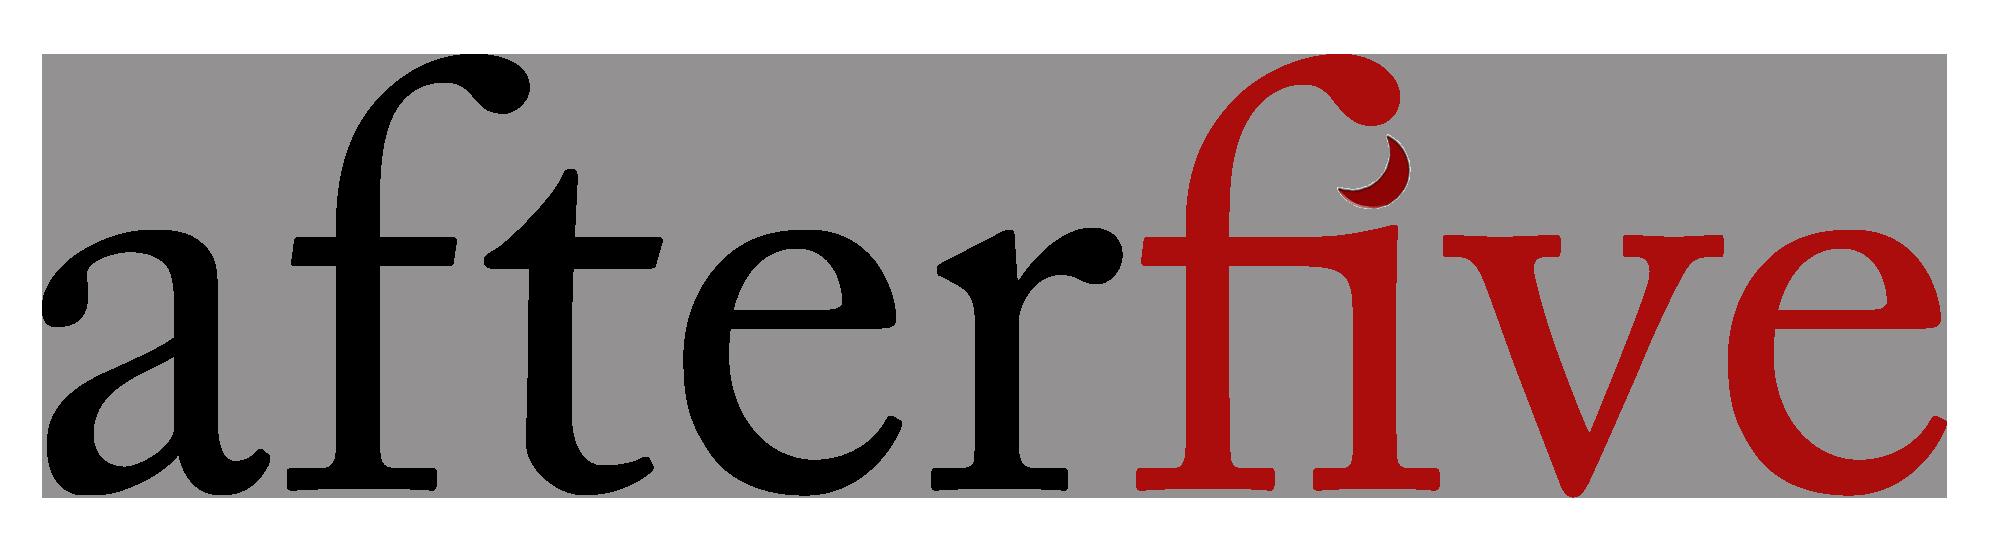 afterfive logo copy